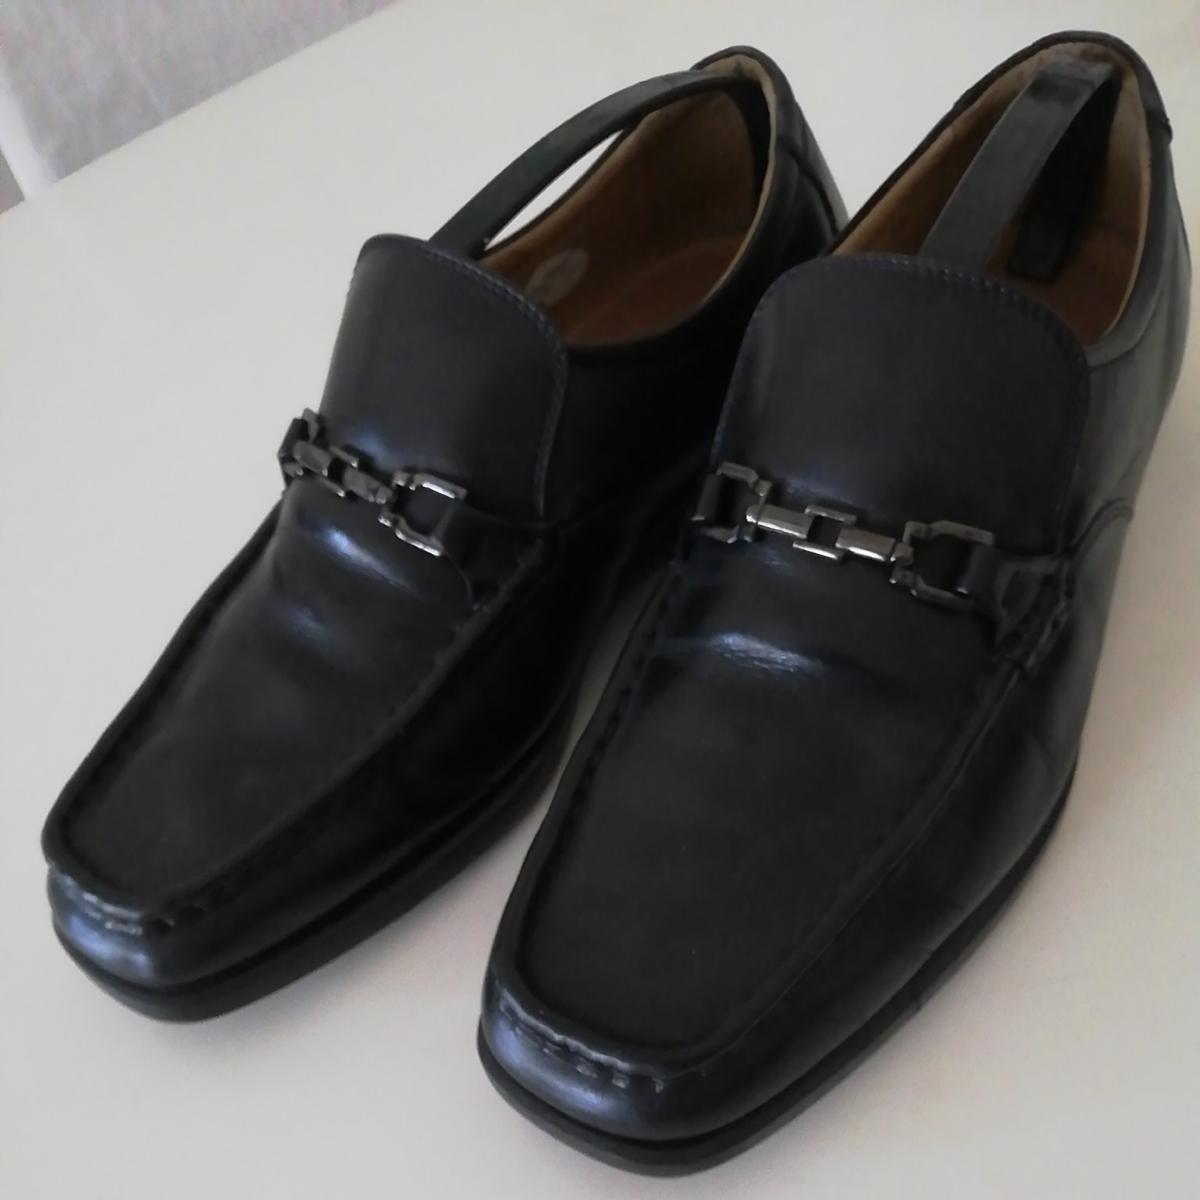 ★BURBERRY LONDON★26cm レザービットローファー バーバリーロンドン メンズ 黒 本革 ビジネスシューズ 本皮 スリッポン 革靴 定番_画像1